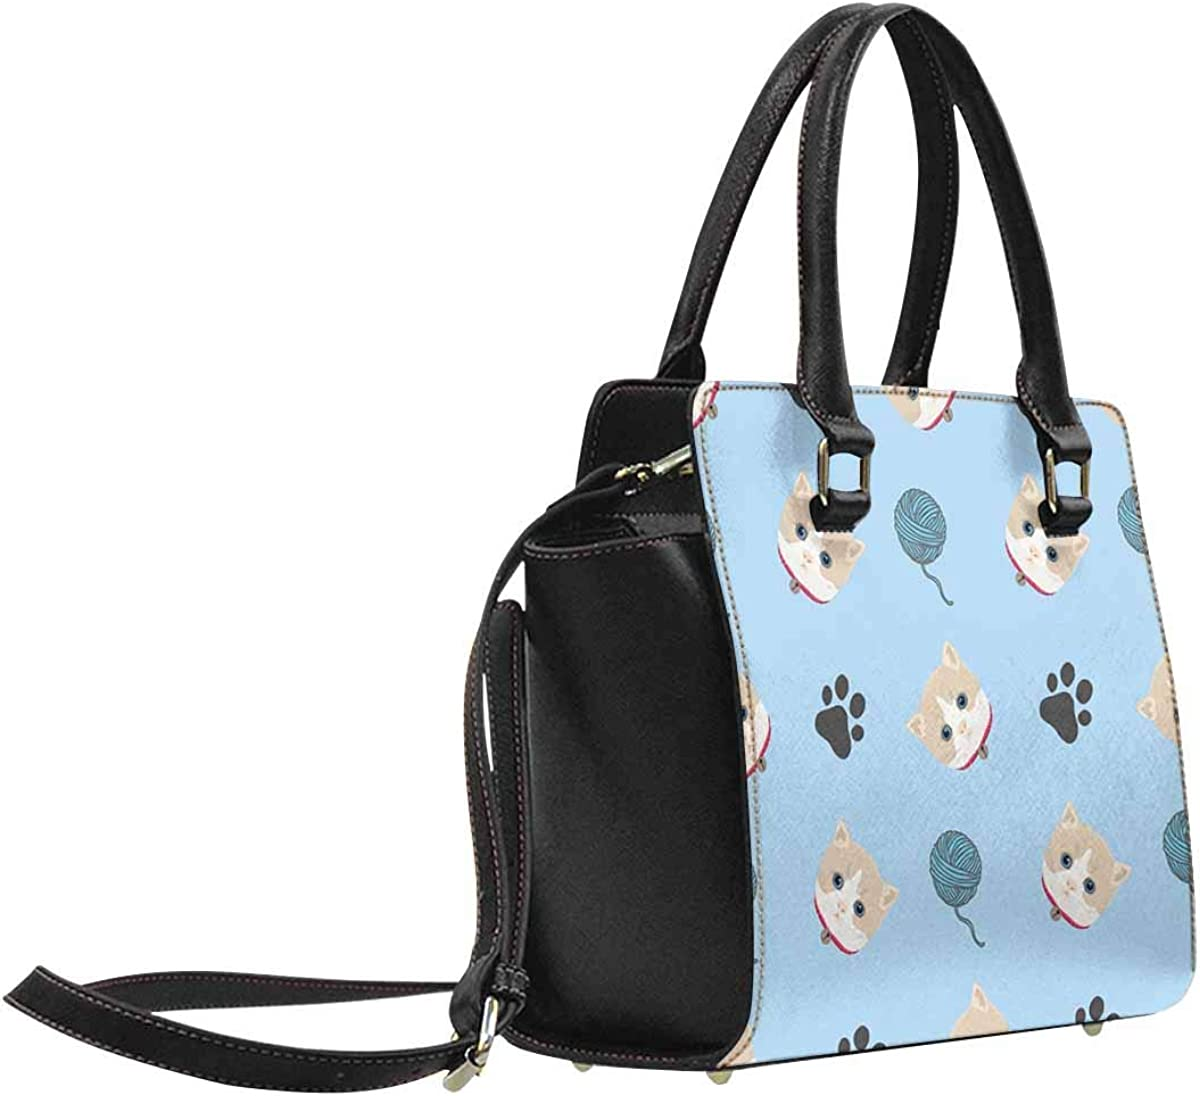 INTERESTPRINT Baby Kitten Cat with Yarn Ball and Footprint Large Capacity PU Leather Handbag Shoulder Bag